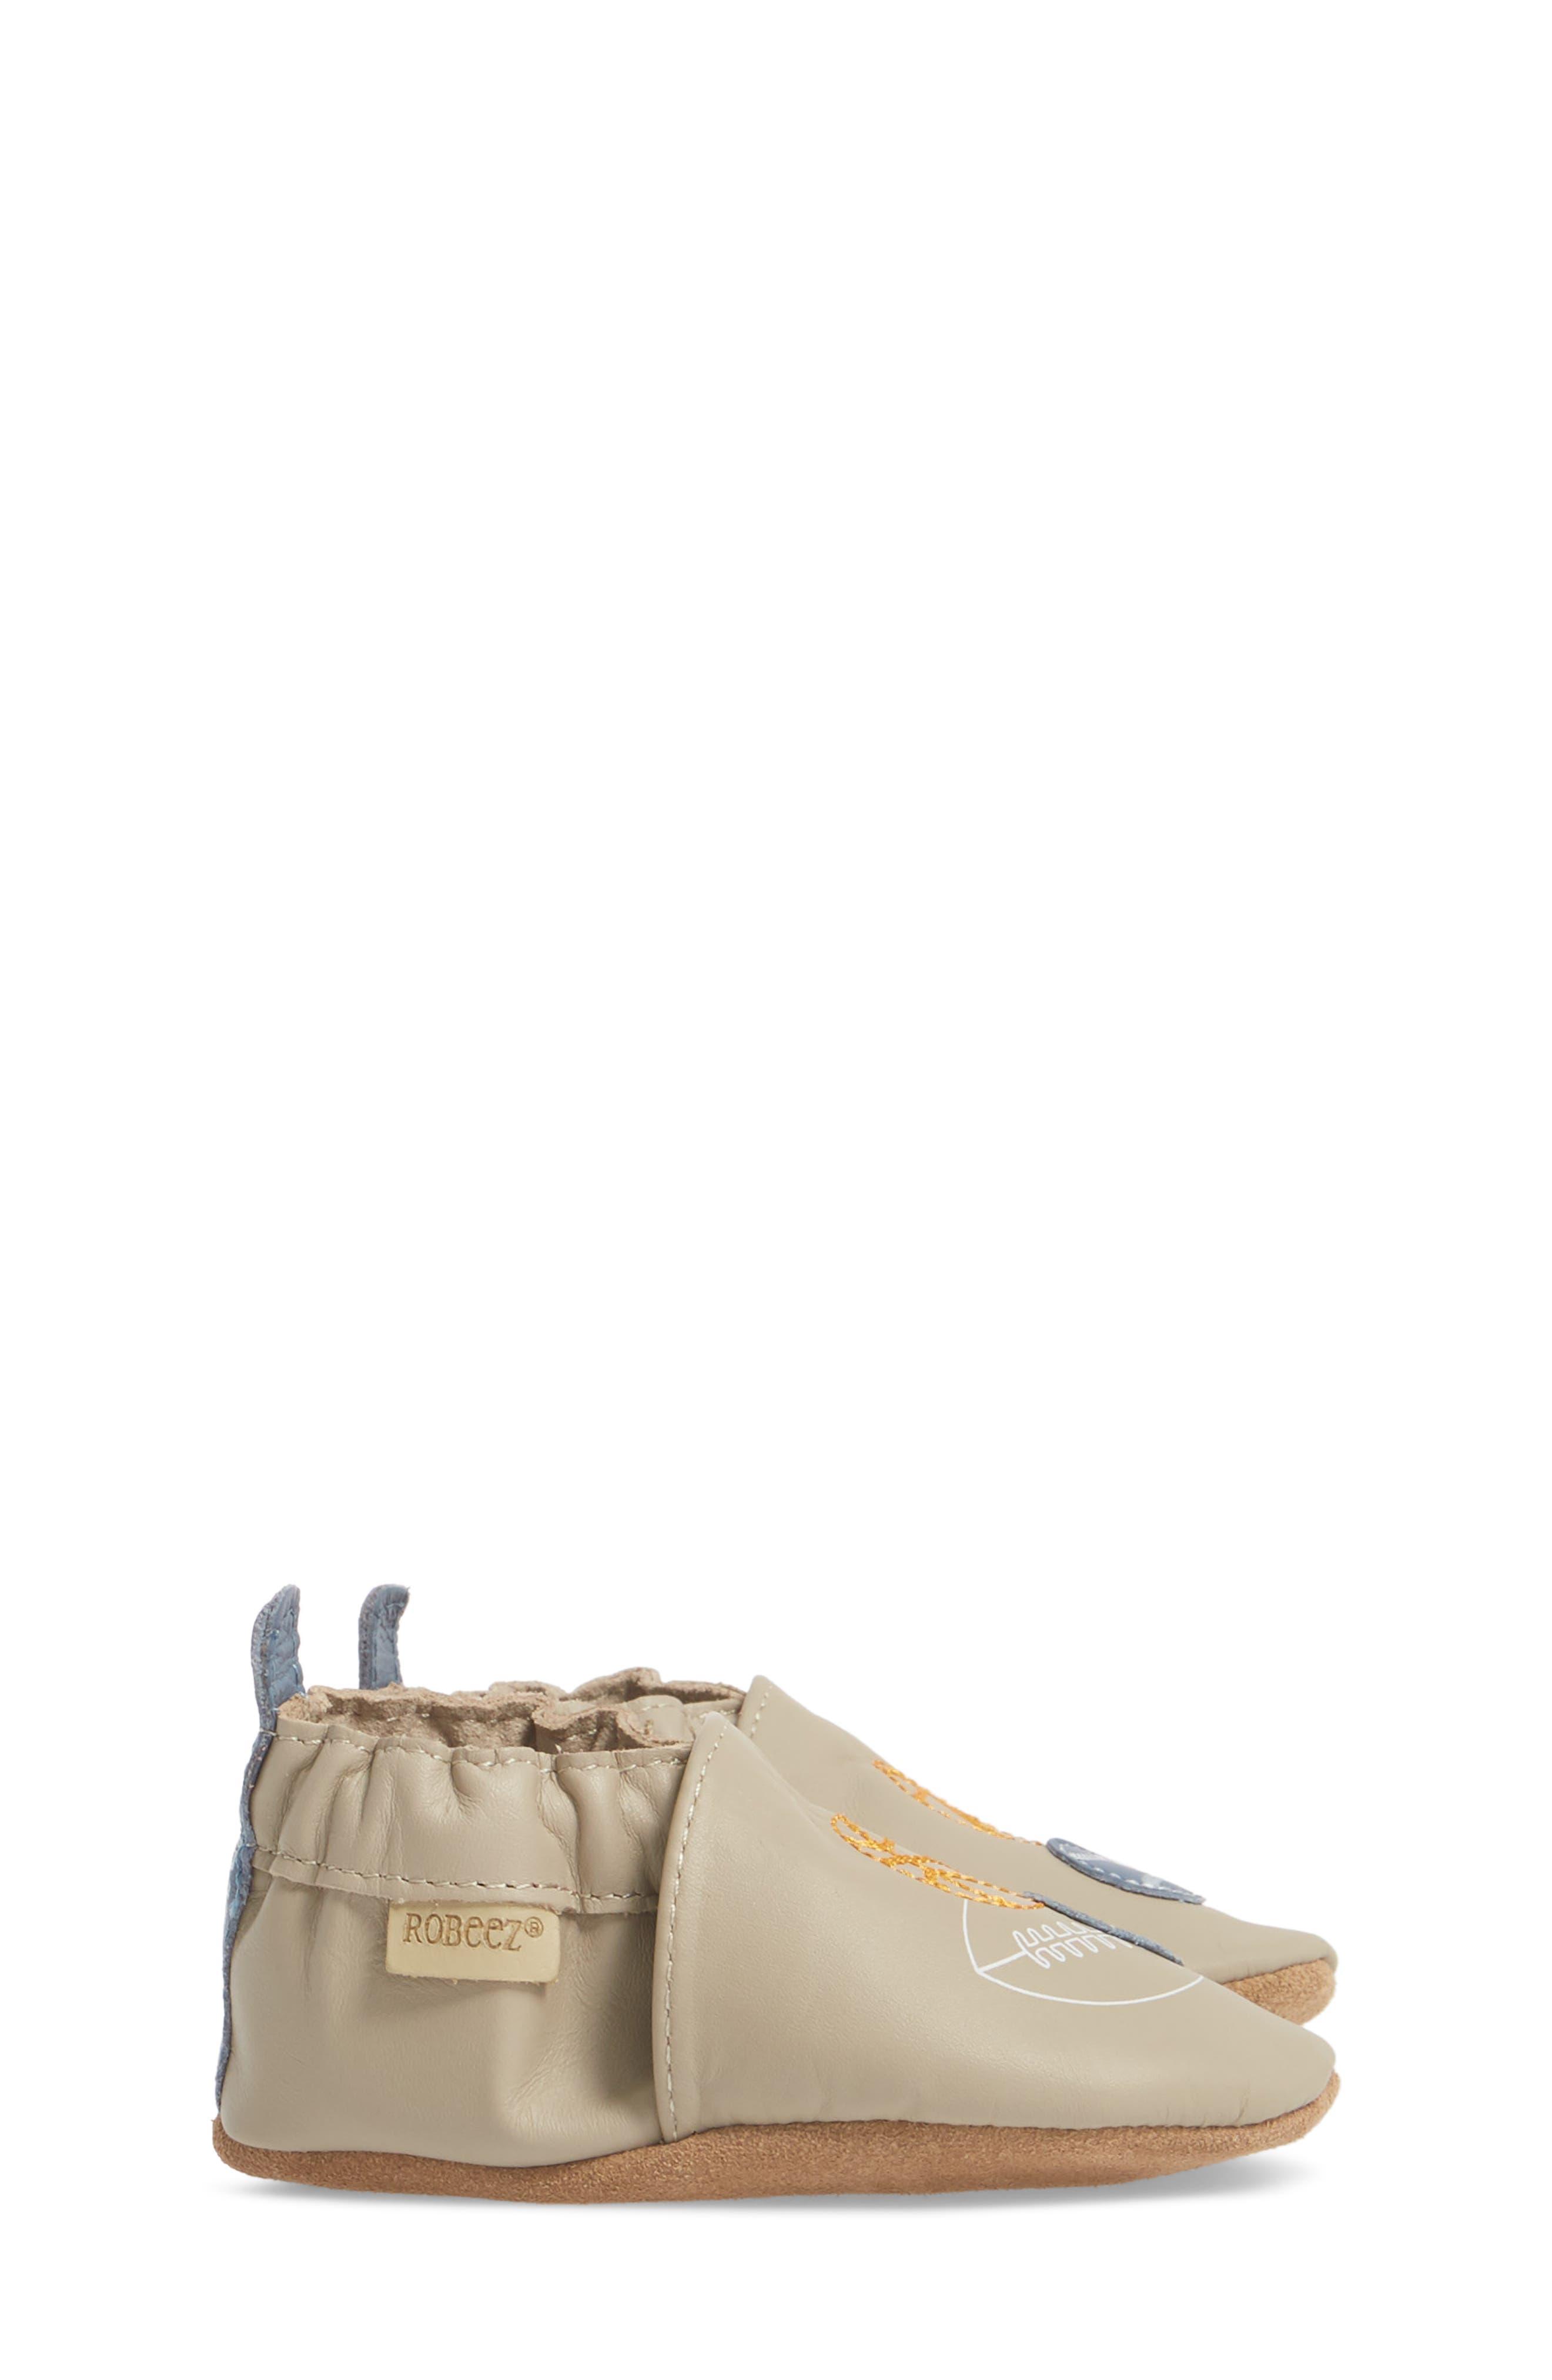 Dream Big Moccasin Crib Shoe,                             Alternate thumbnail 4, color,                             Taupe